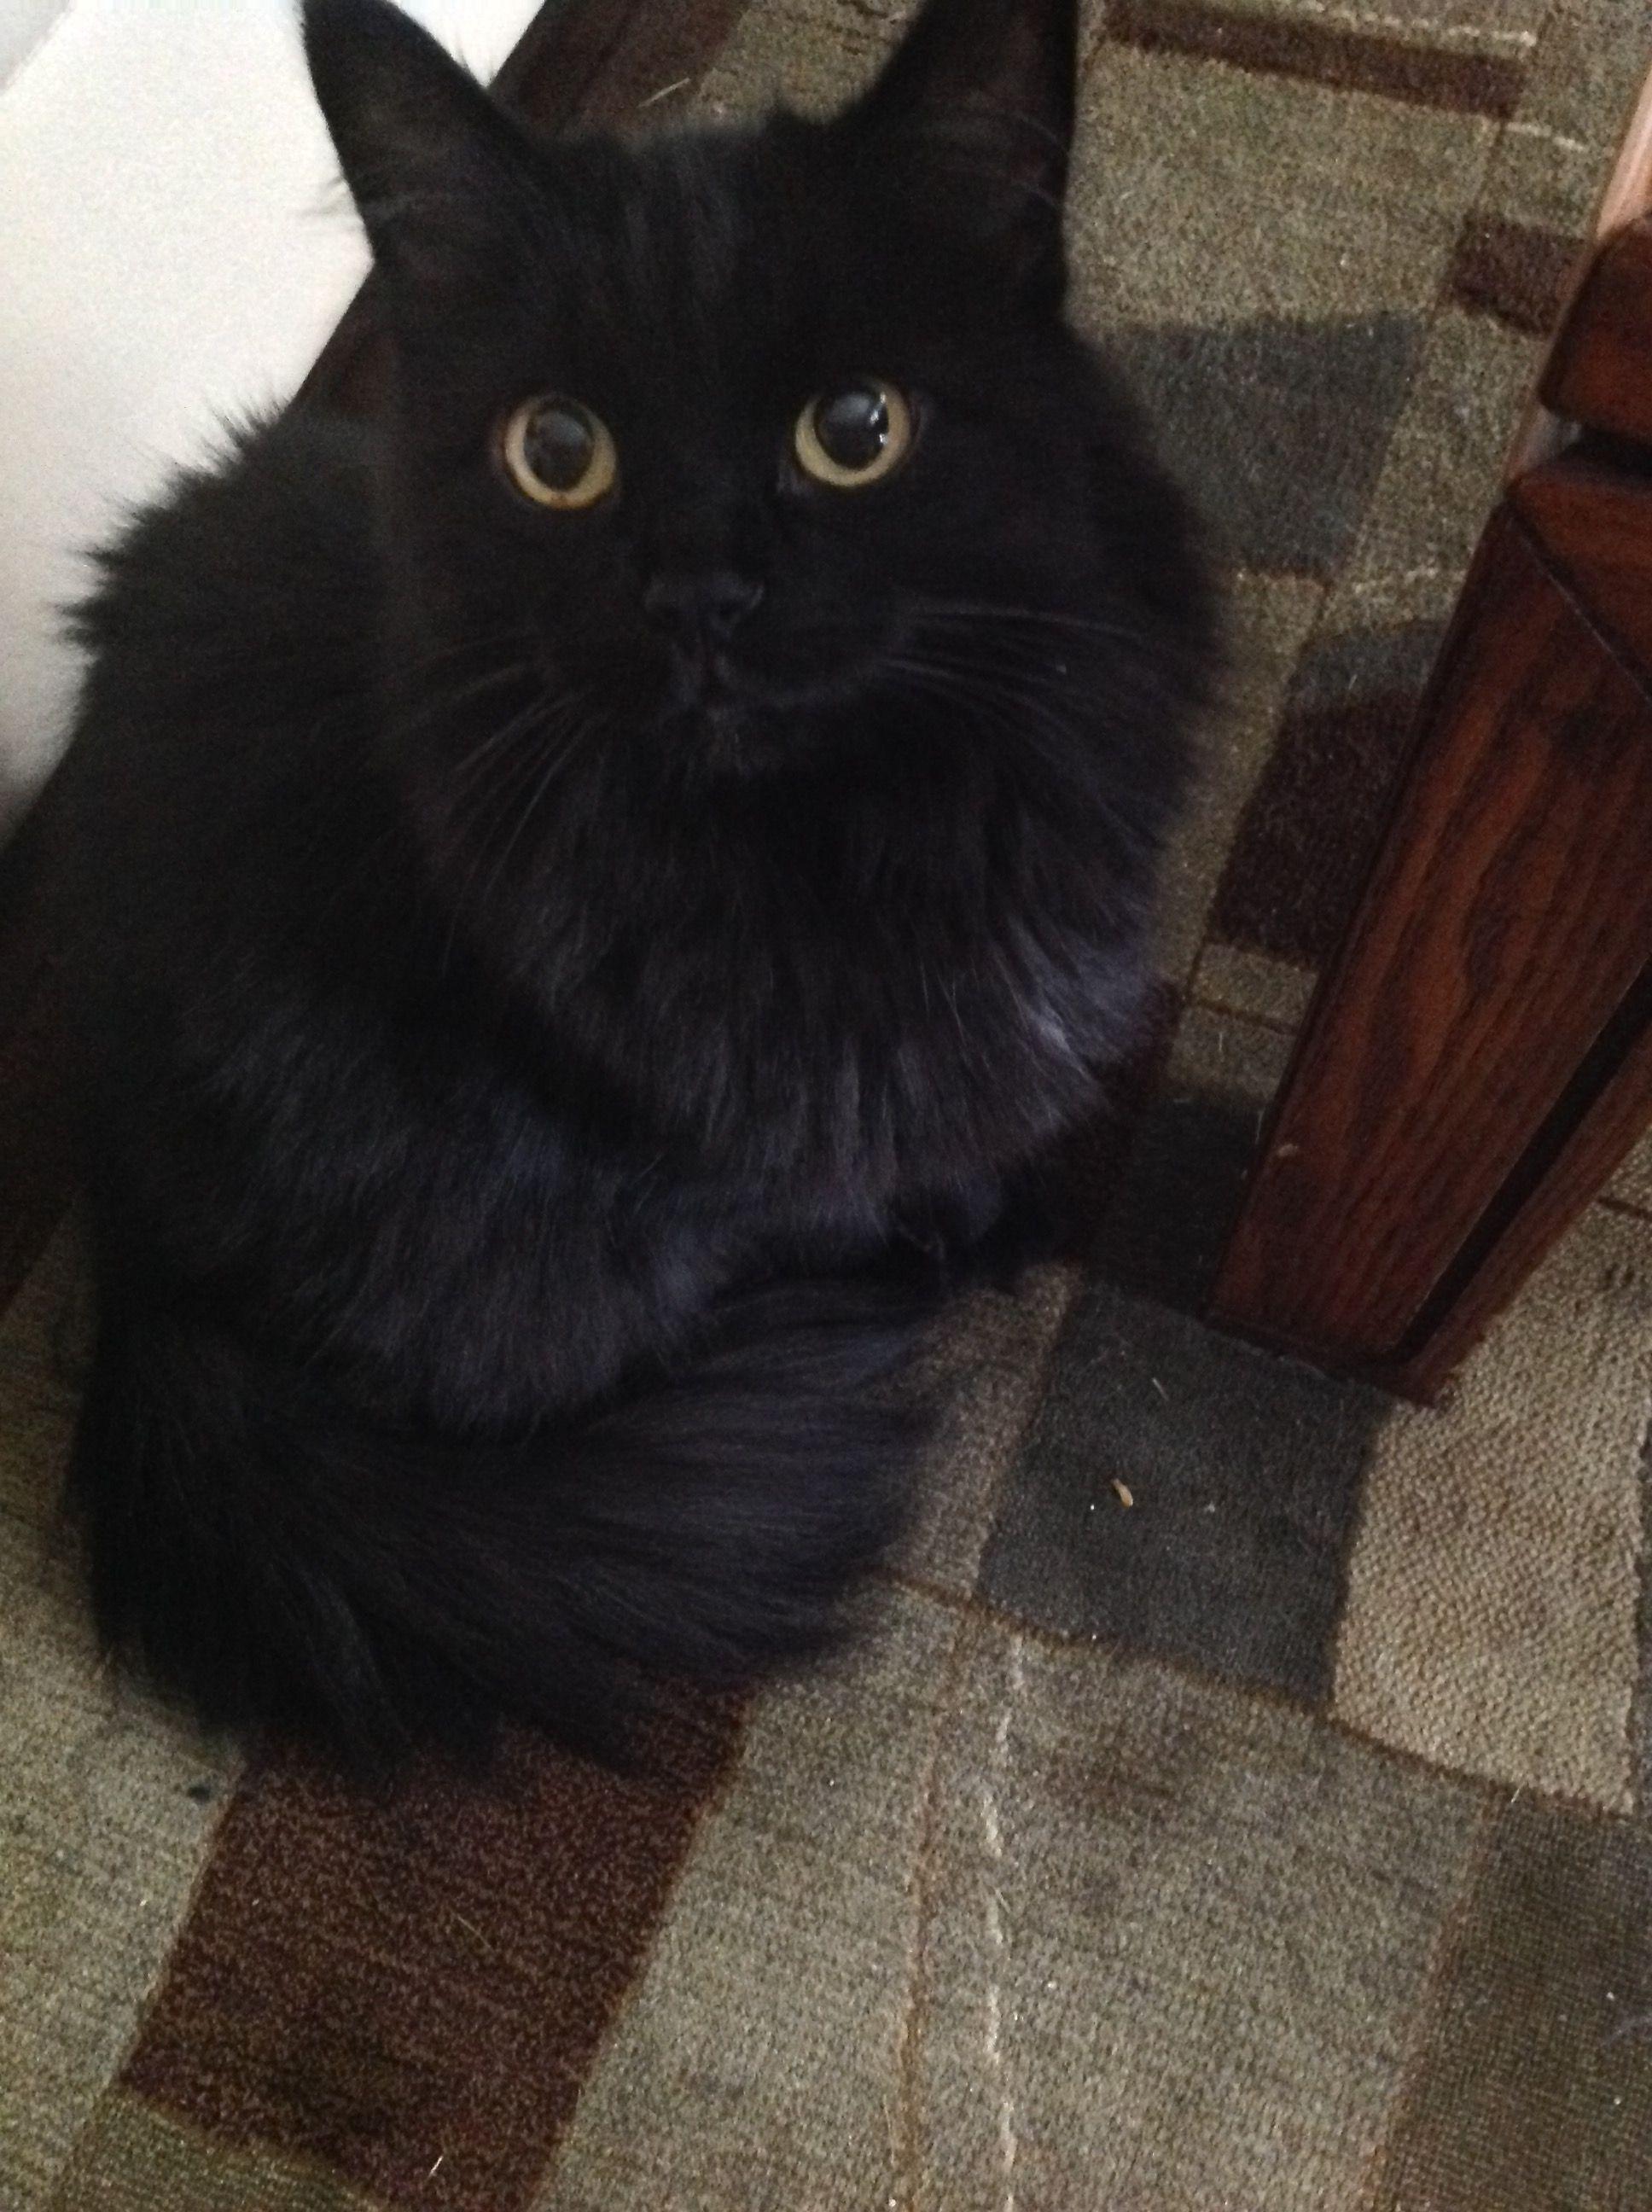 My Girl Sasha 💗 Black cat, Fluffy cat, Cat photo